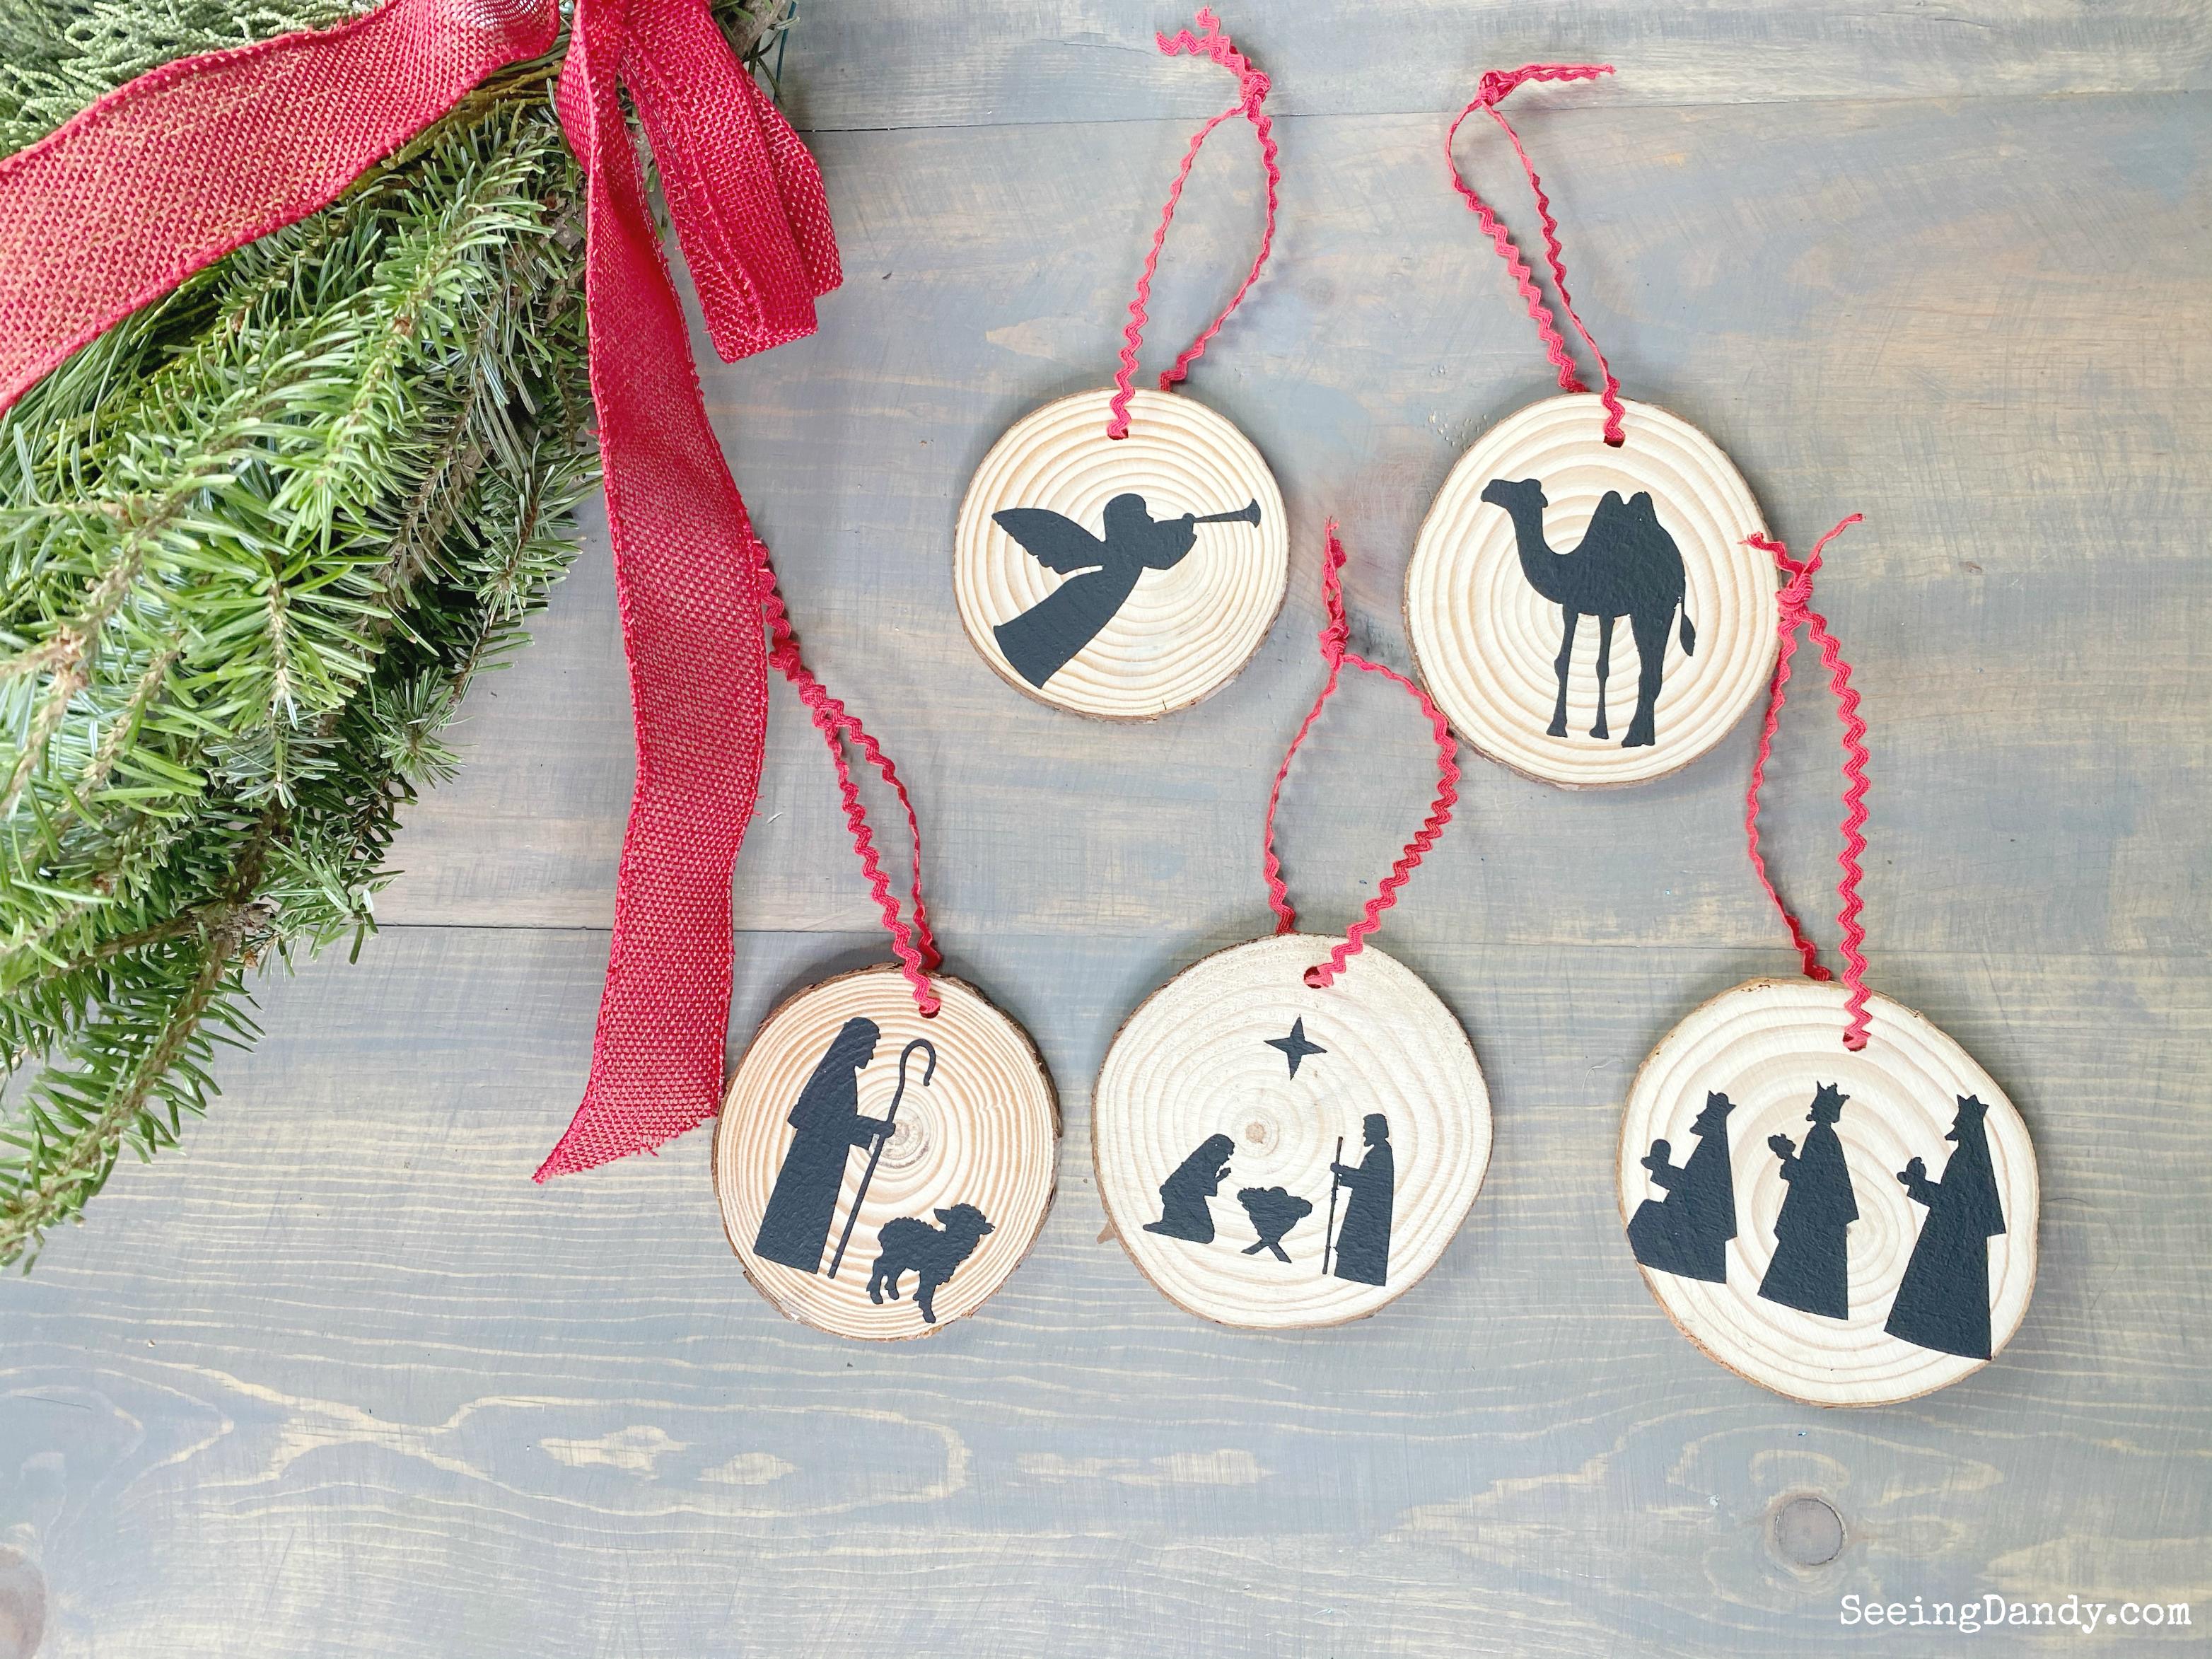 Easy to make nativity Christmas ornaments